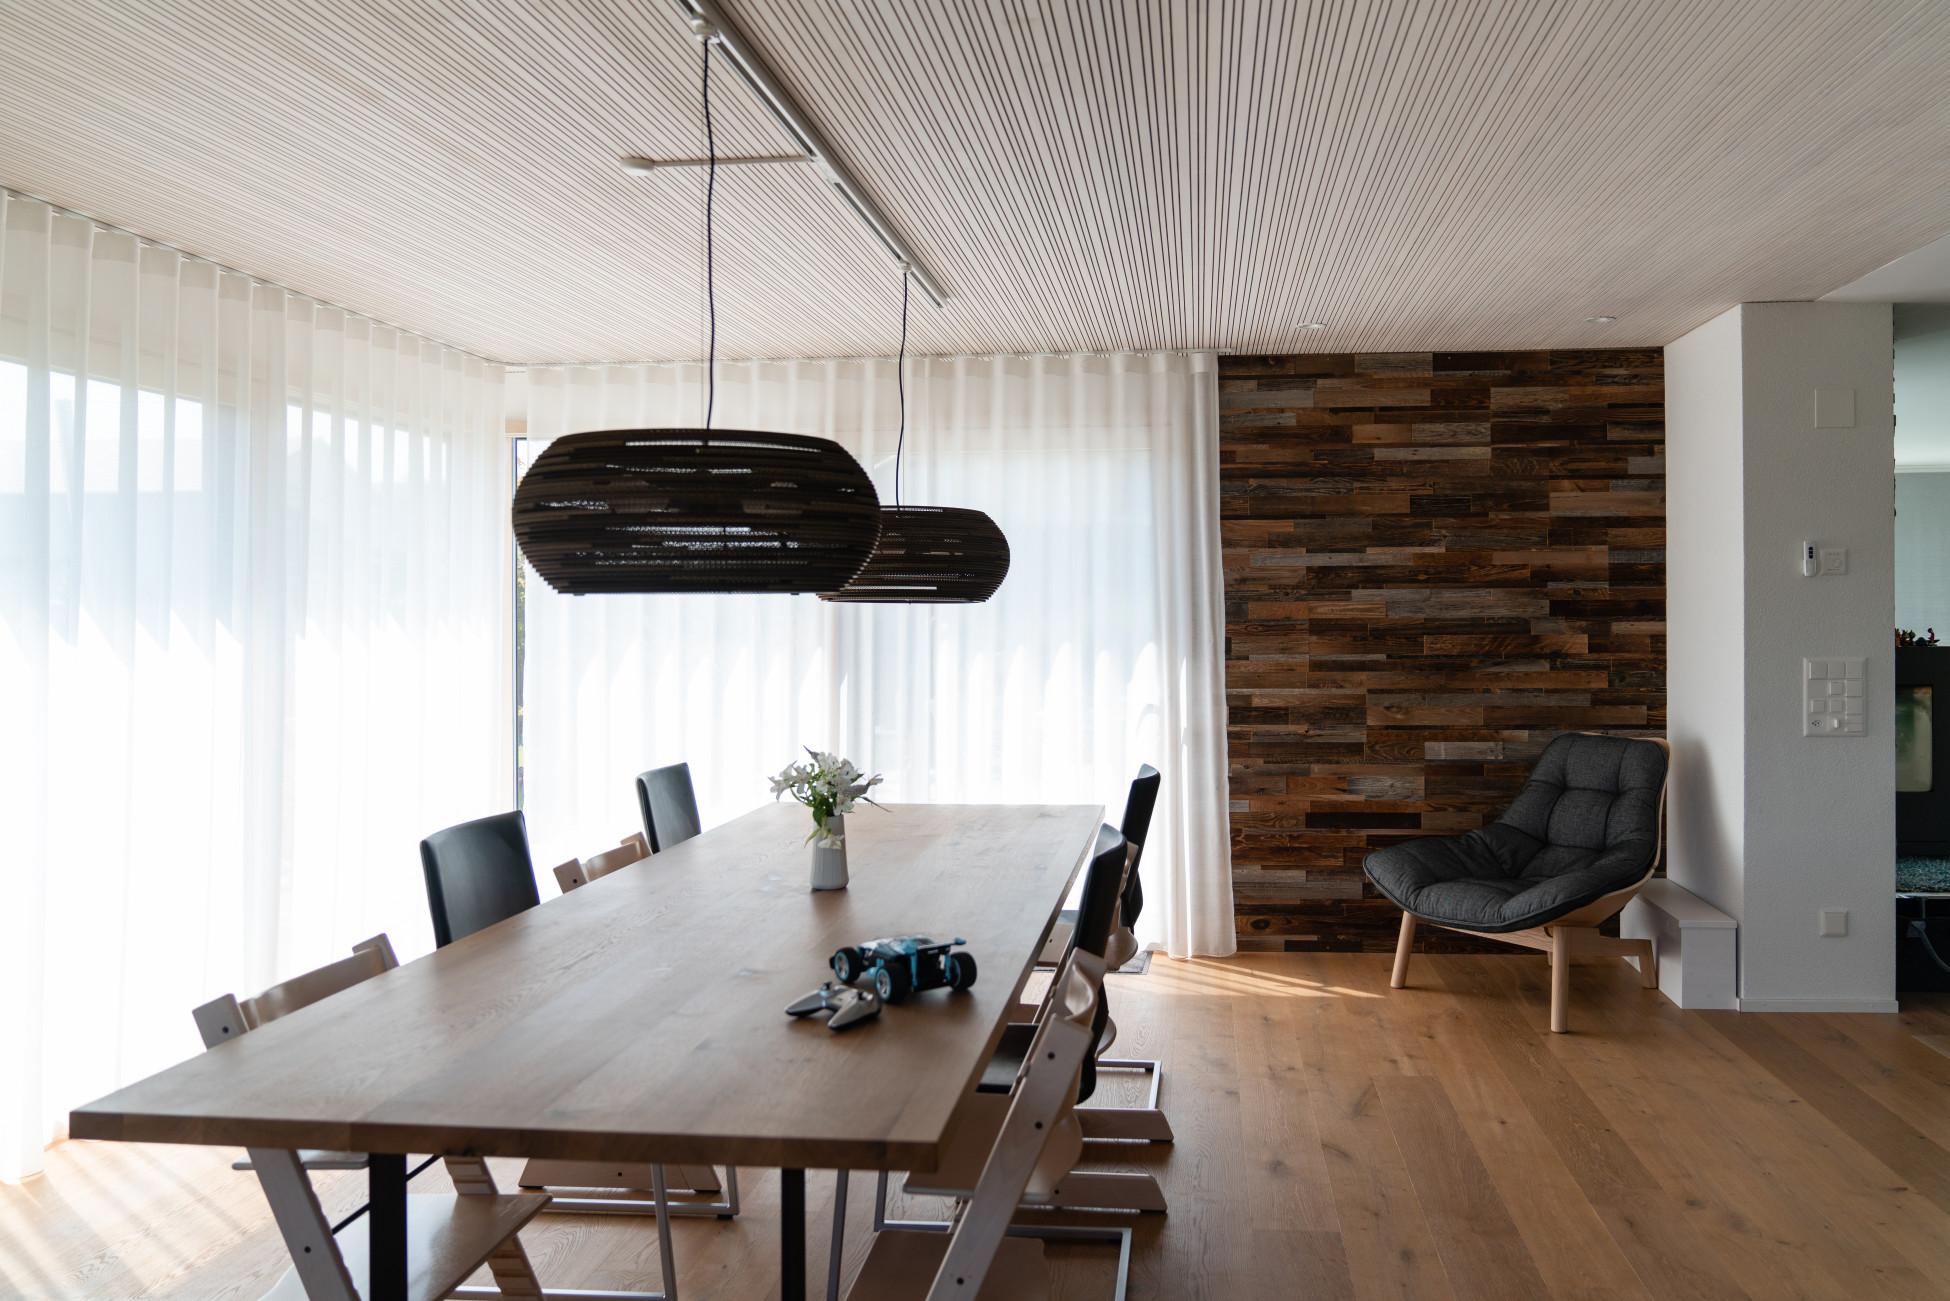 Anbau Einfamilienhaus in Holzelementbauweise mit Akustikdecke